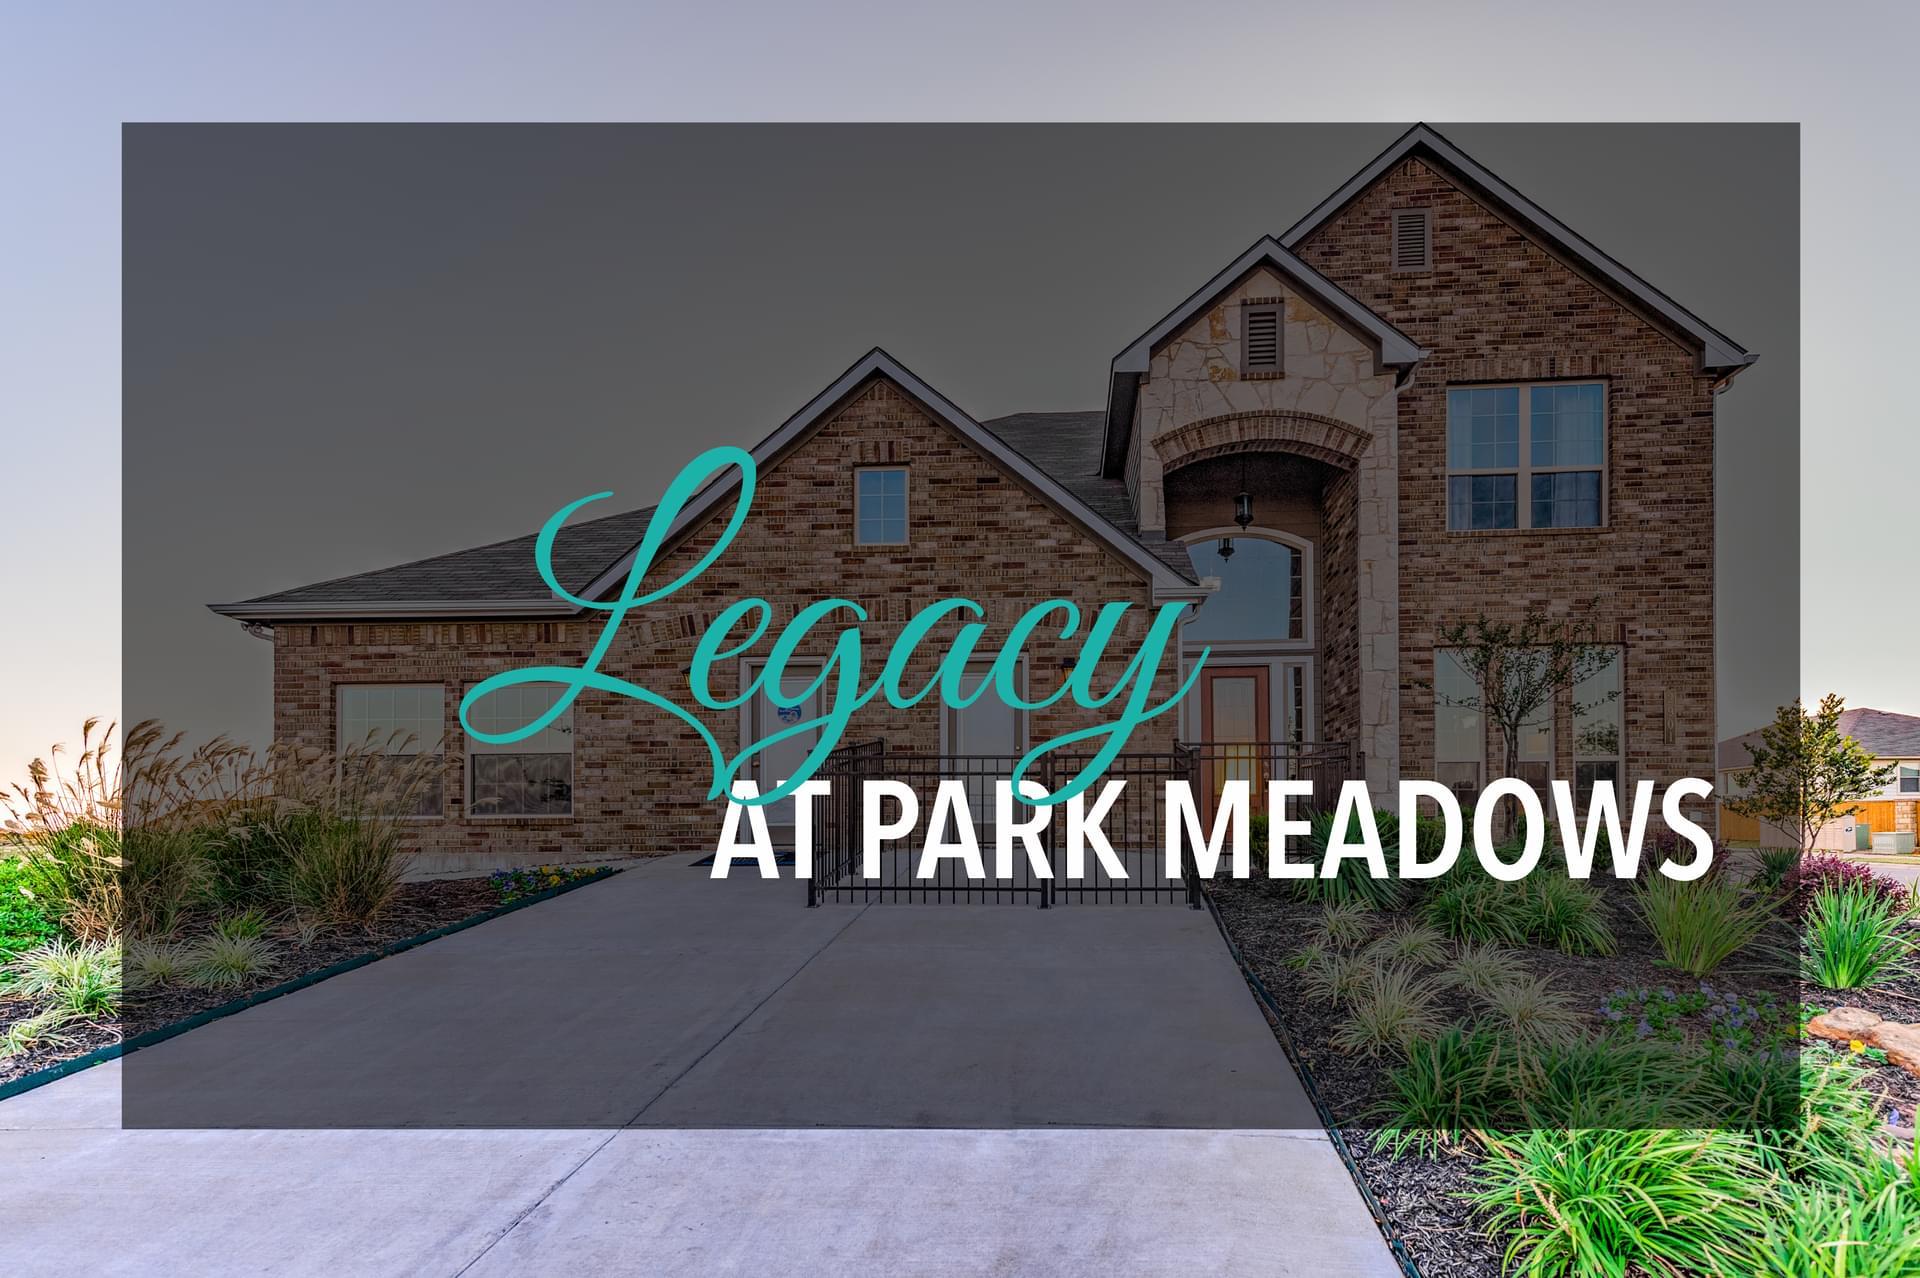 Legacy at Park Meadows in Waco, TX